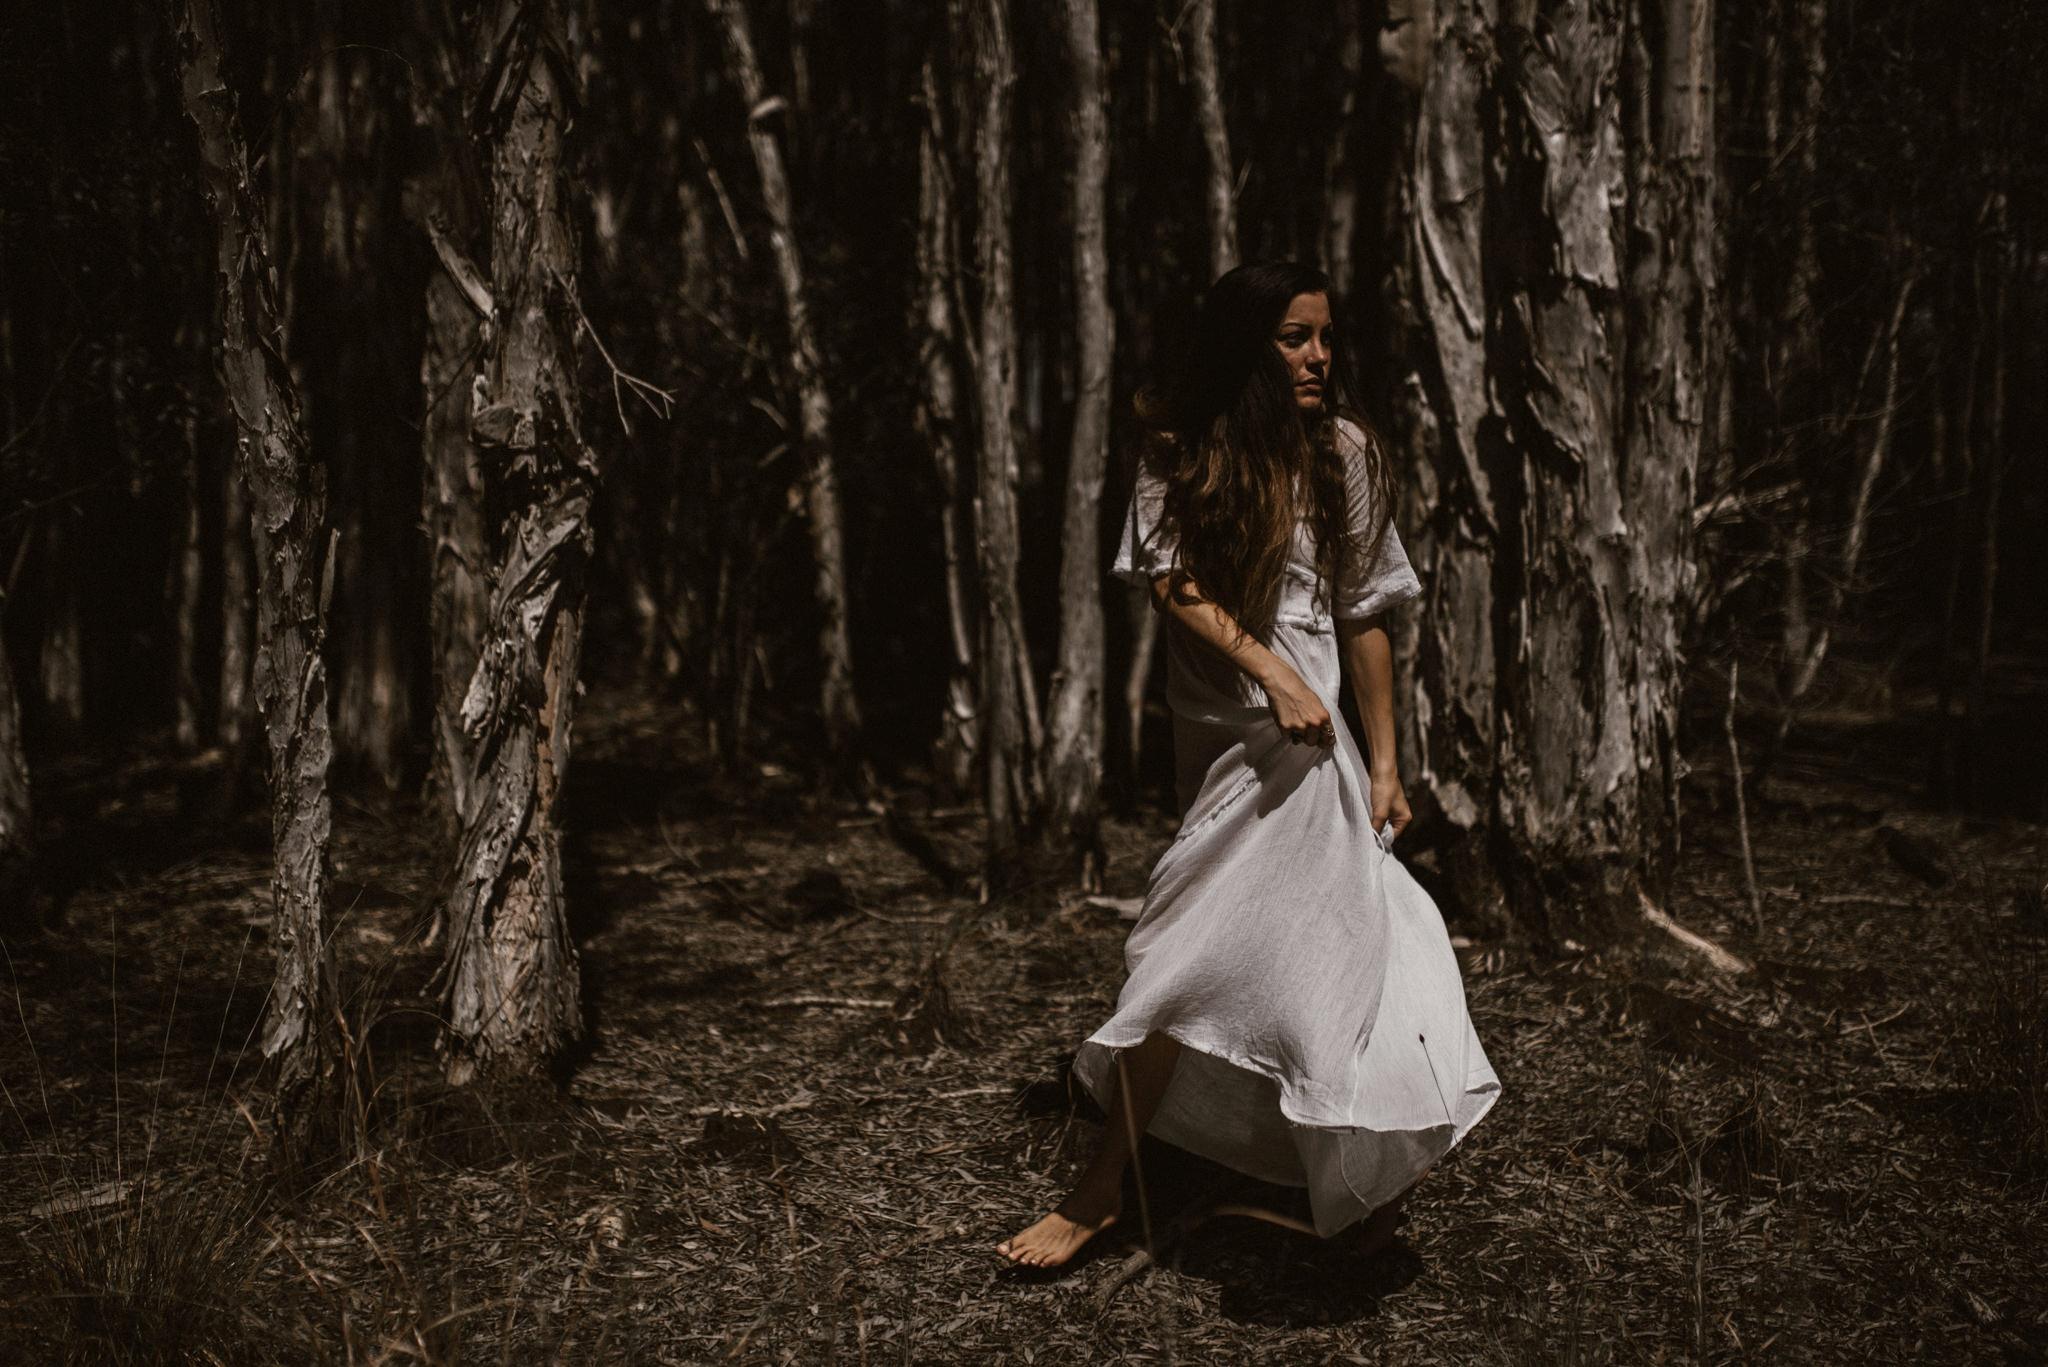 twyla jones photography - traveling dress--29_treasure coast florida.jpg